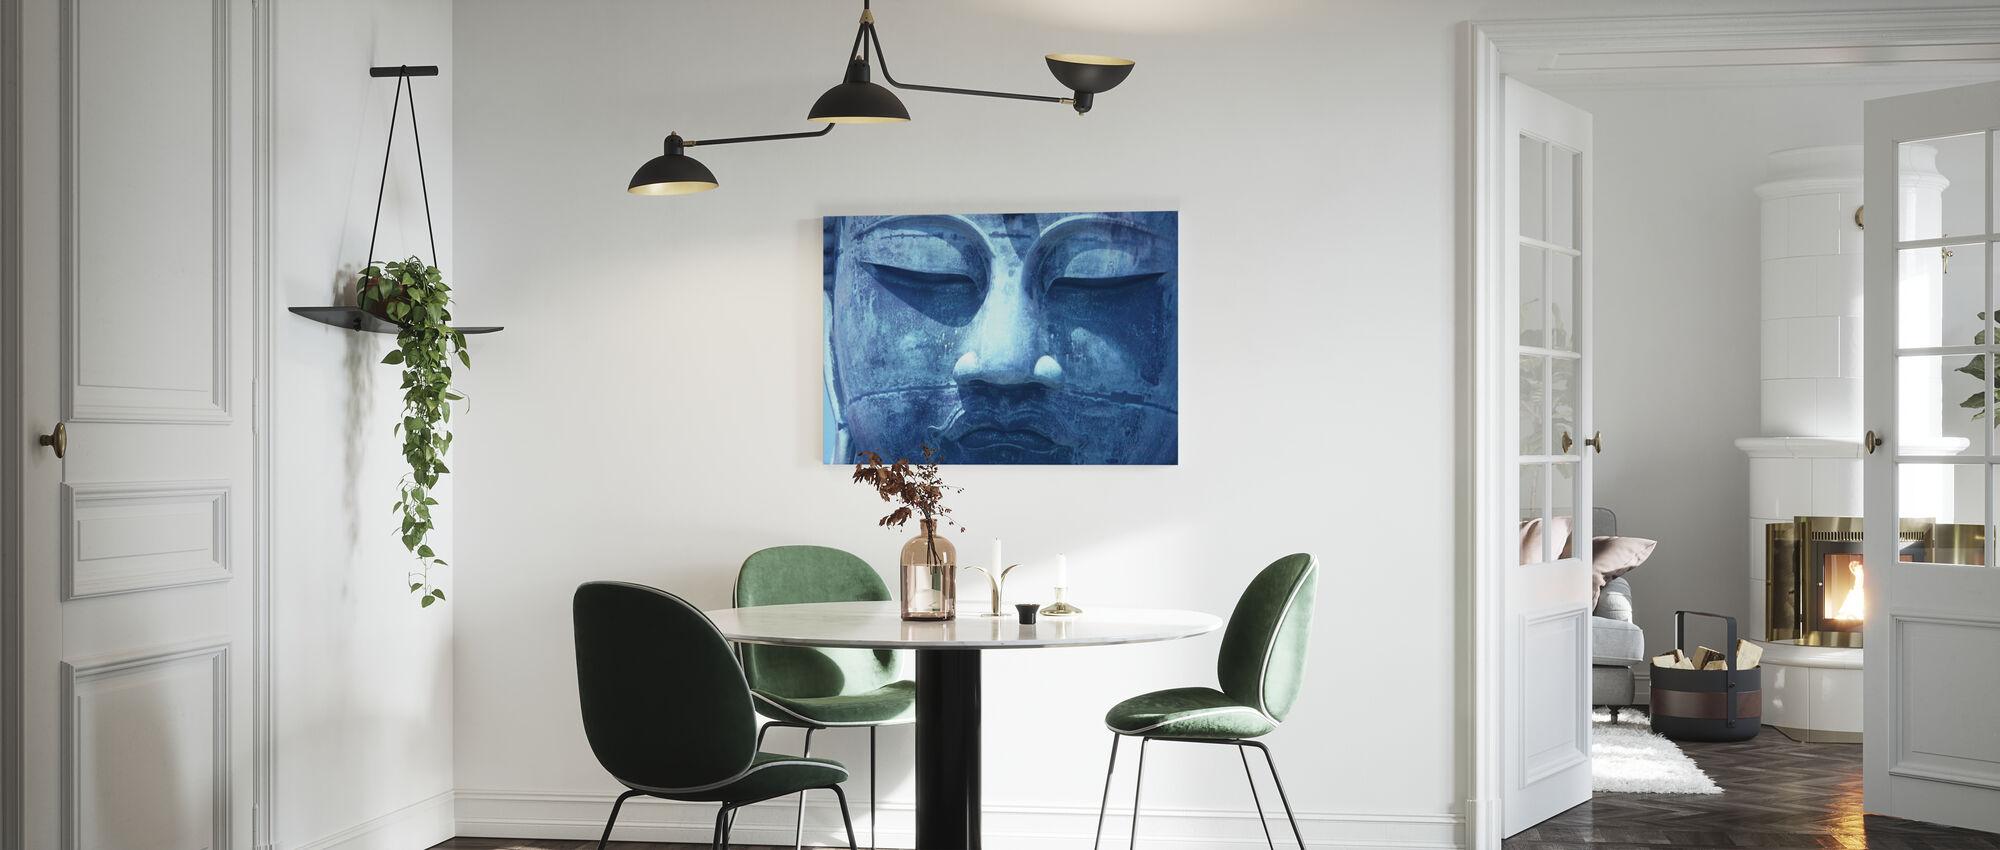 Blauwe Boeddha - Canvas print - Keuken